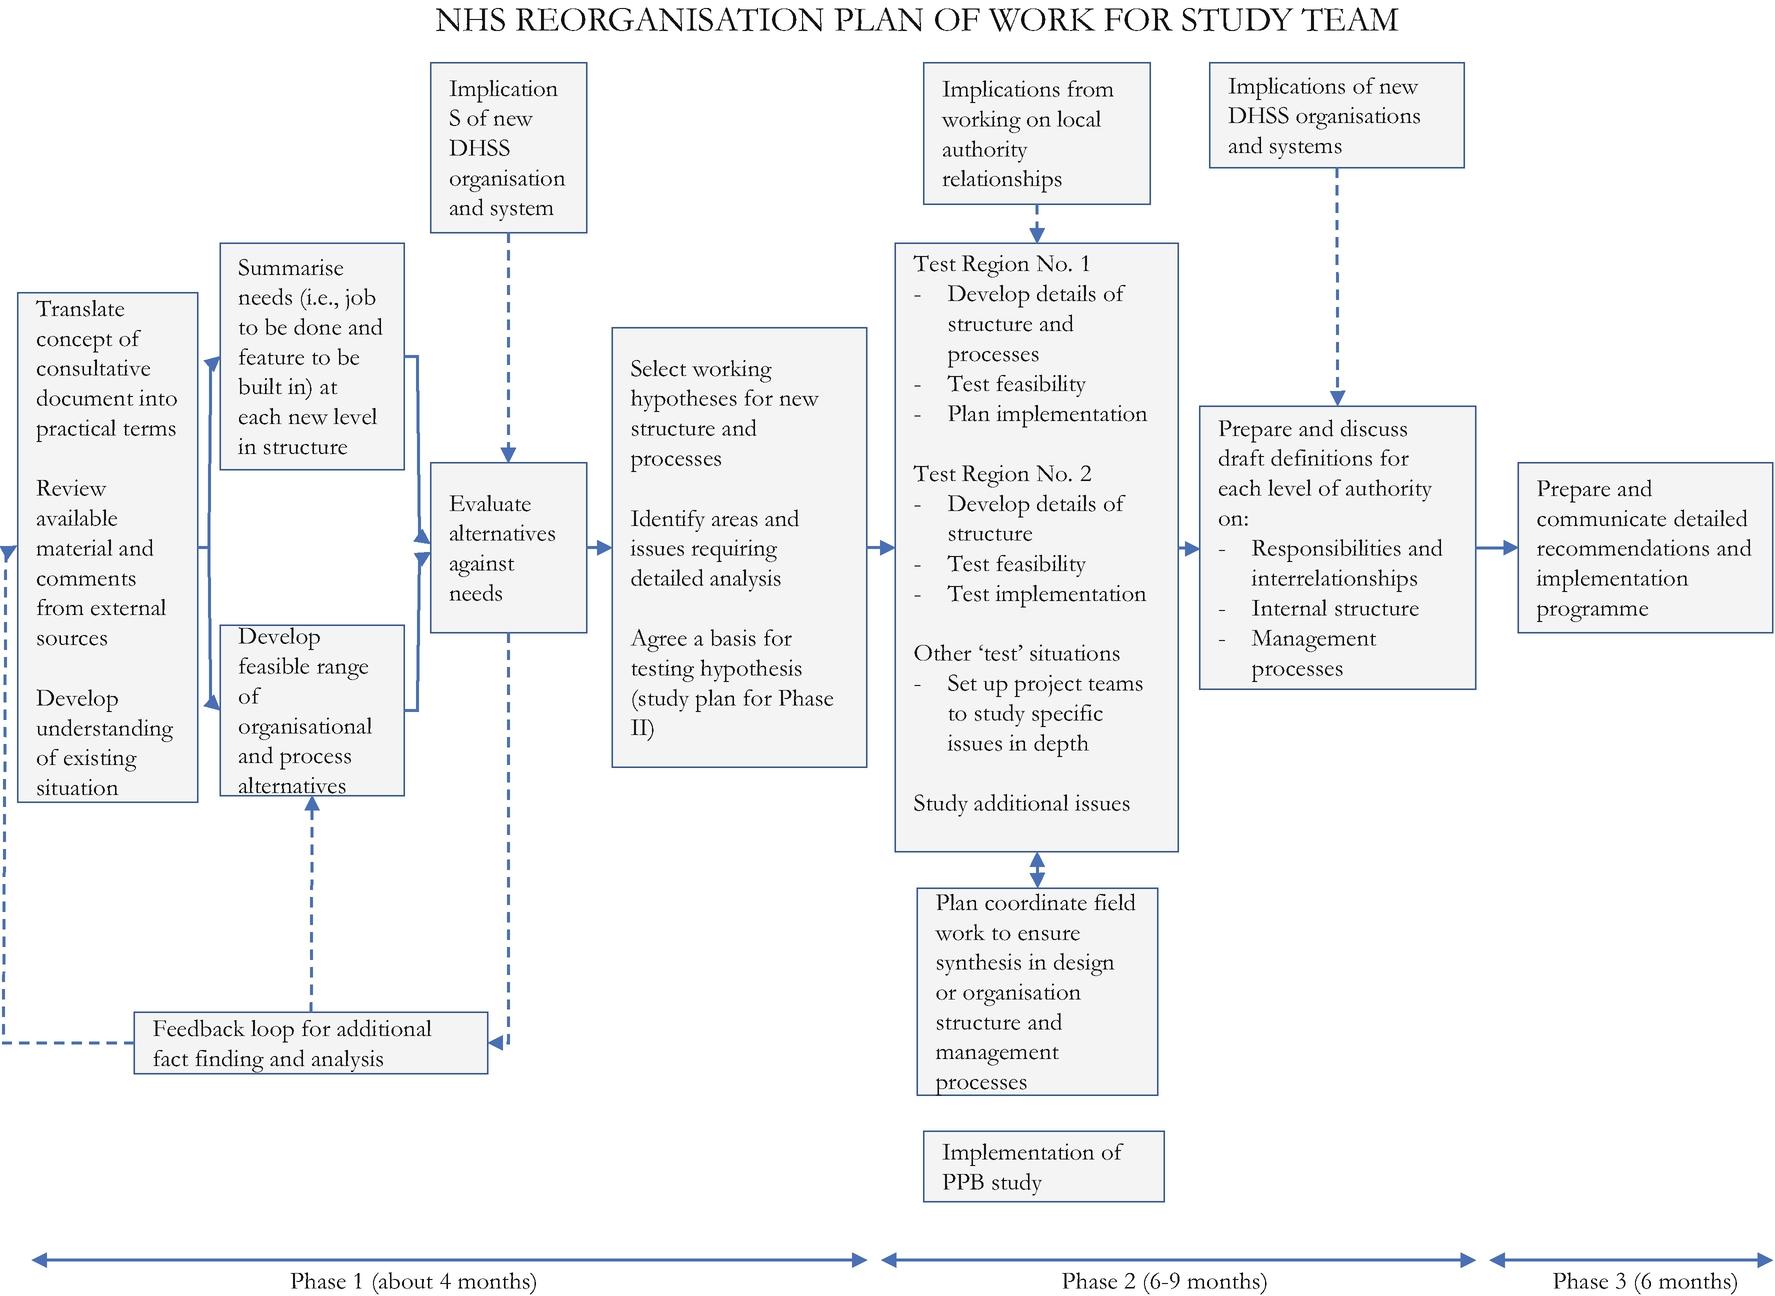 Reorganising, 1970S: The 1974 National Health Service  Dhss Menu Forms 5 Week Menu Cycle